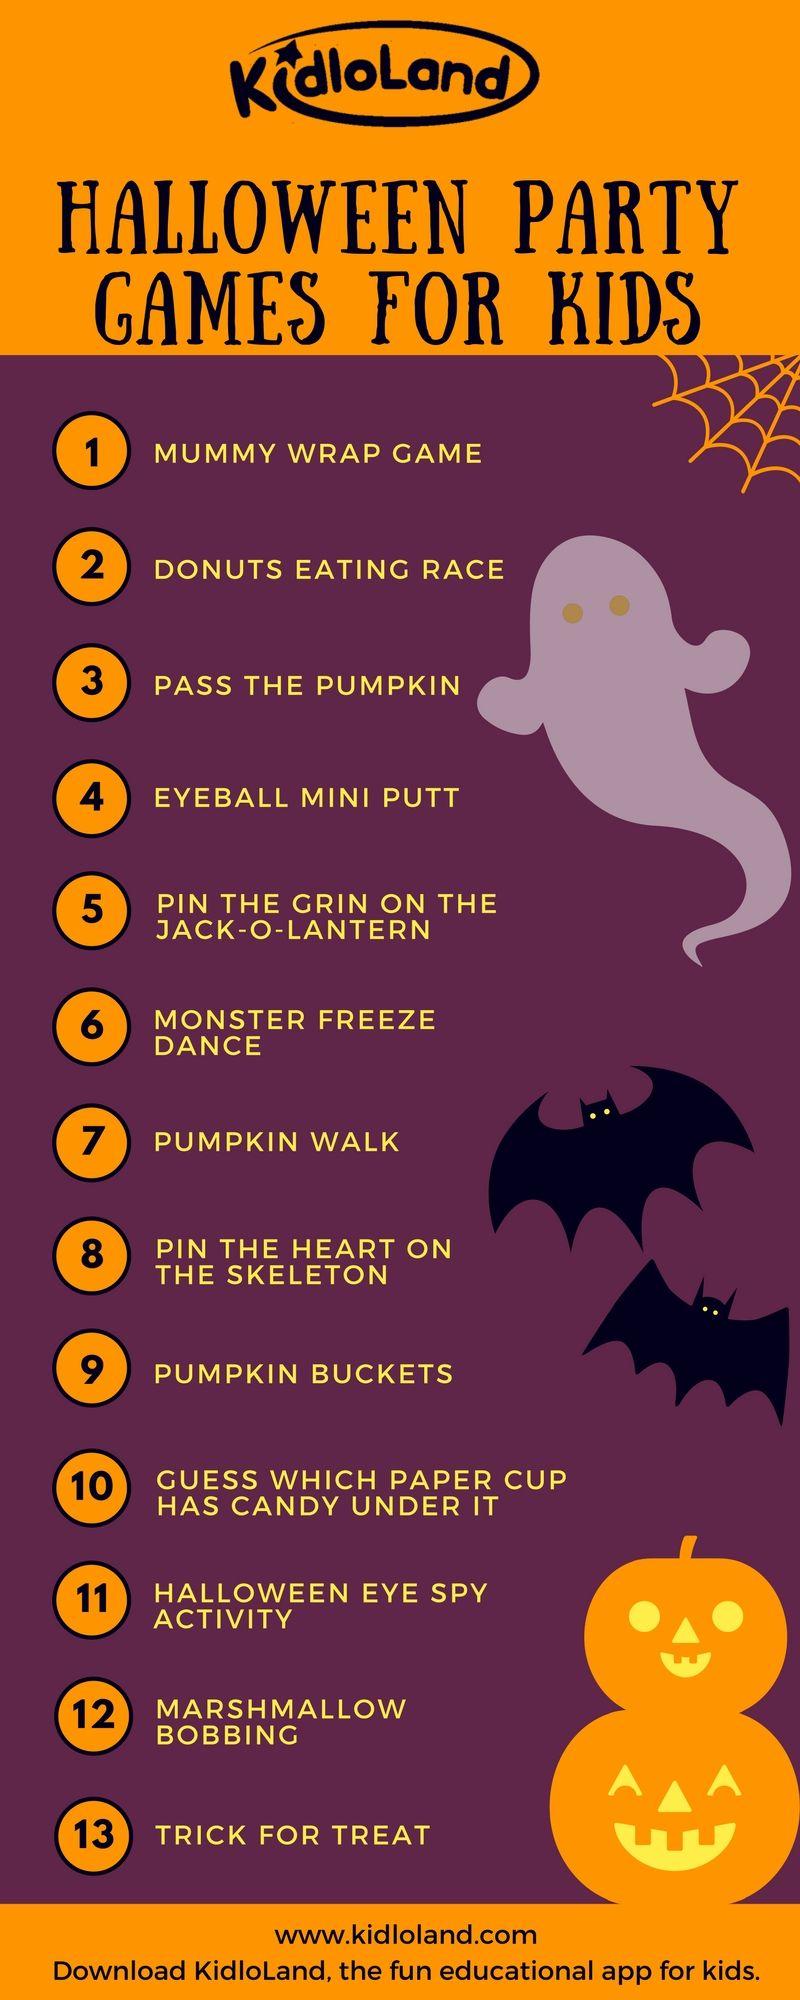 13 Fun Halloween Party Games For Kids Kids Halloween